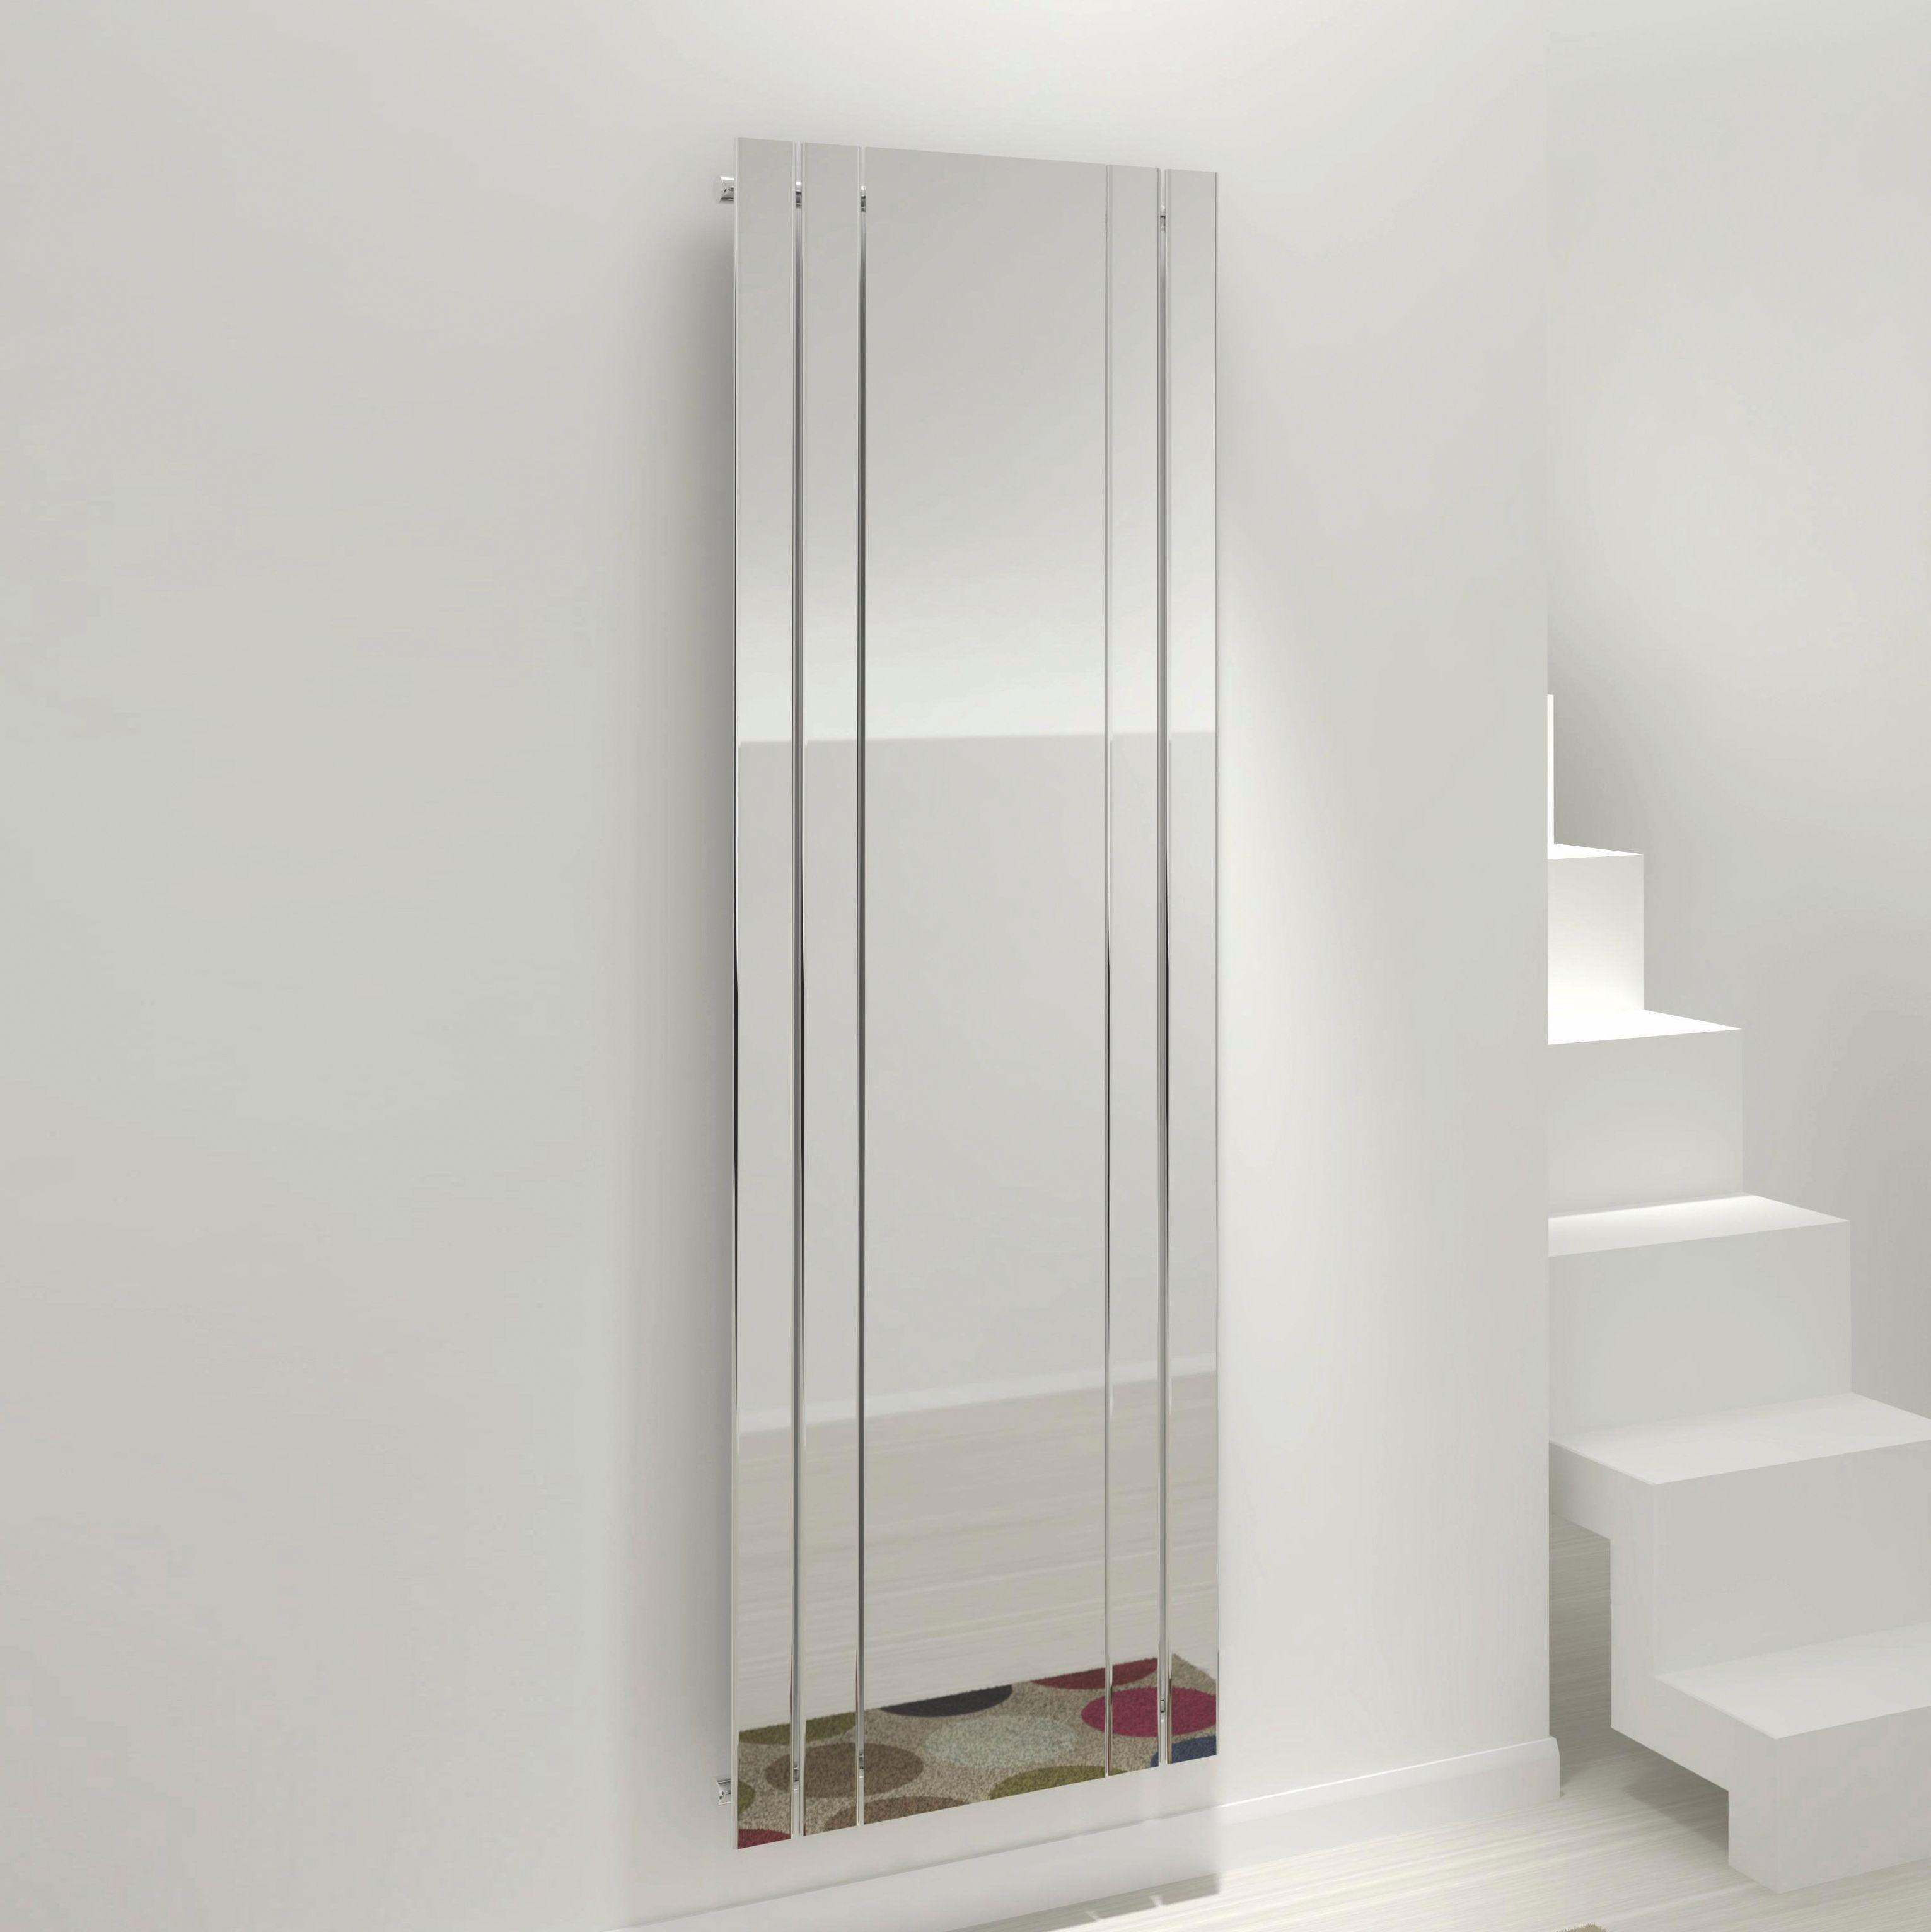 kudox tova mirror vertical radiator chrome h 1800 mm w 600 mm